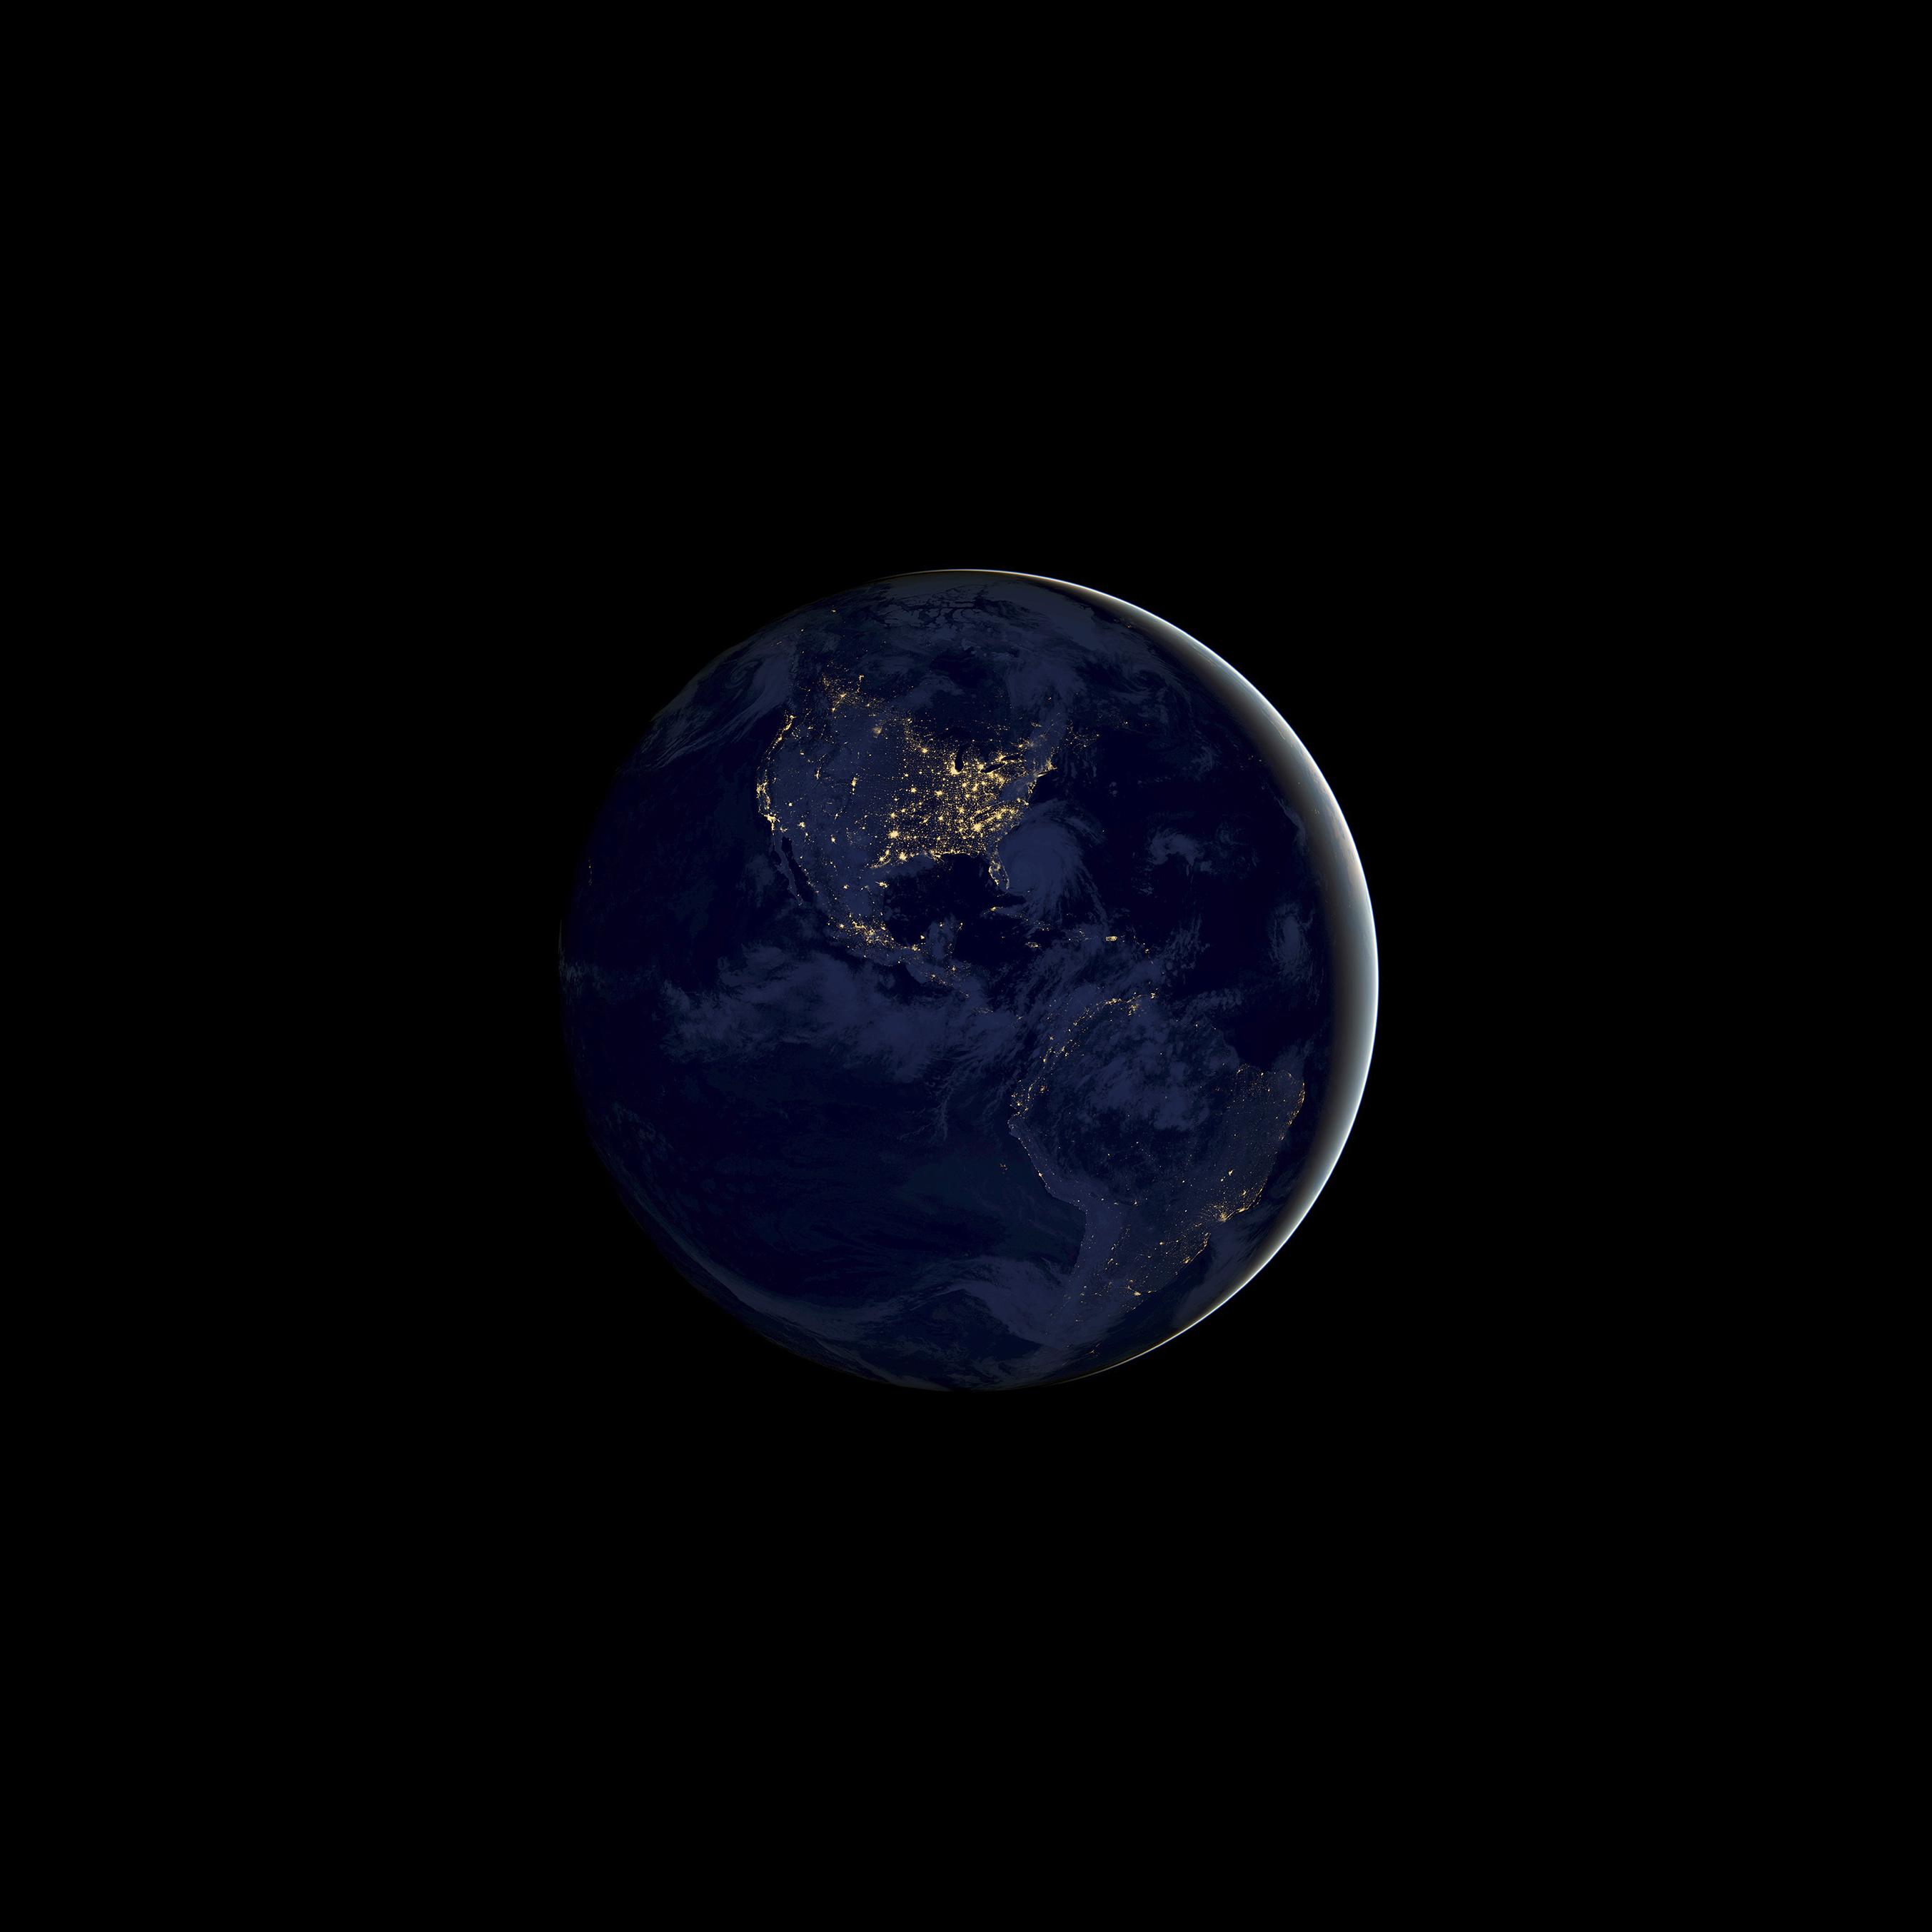 Earth Night iOS 11 GM iPhone wallpapers - Trọn bộ hình nền mới của iOS 11